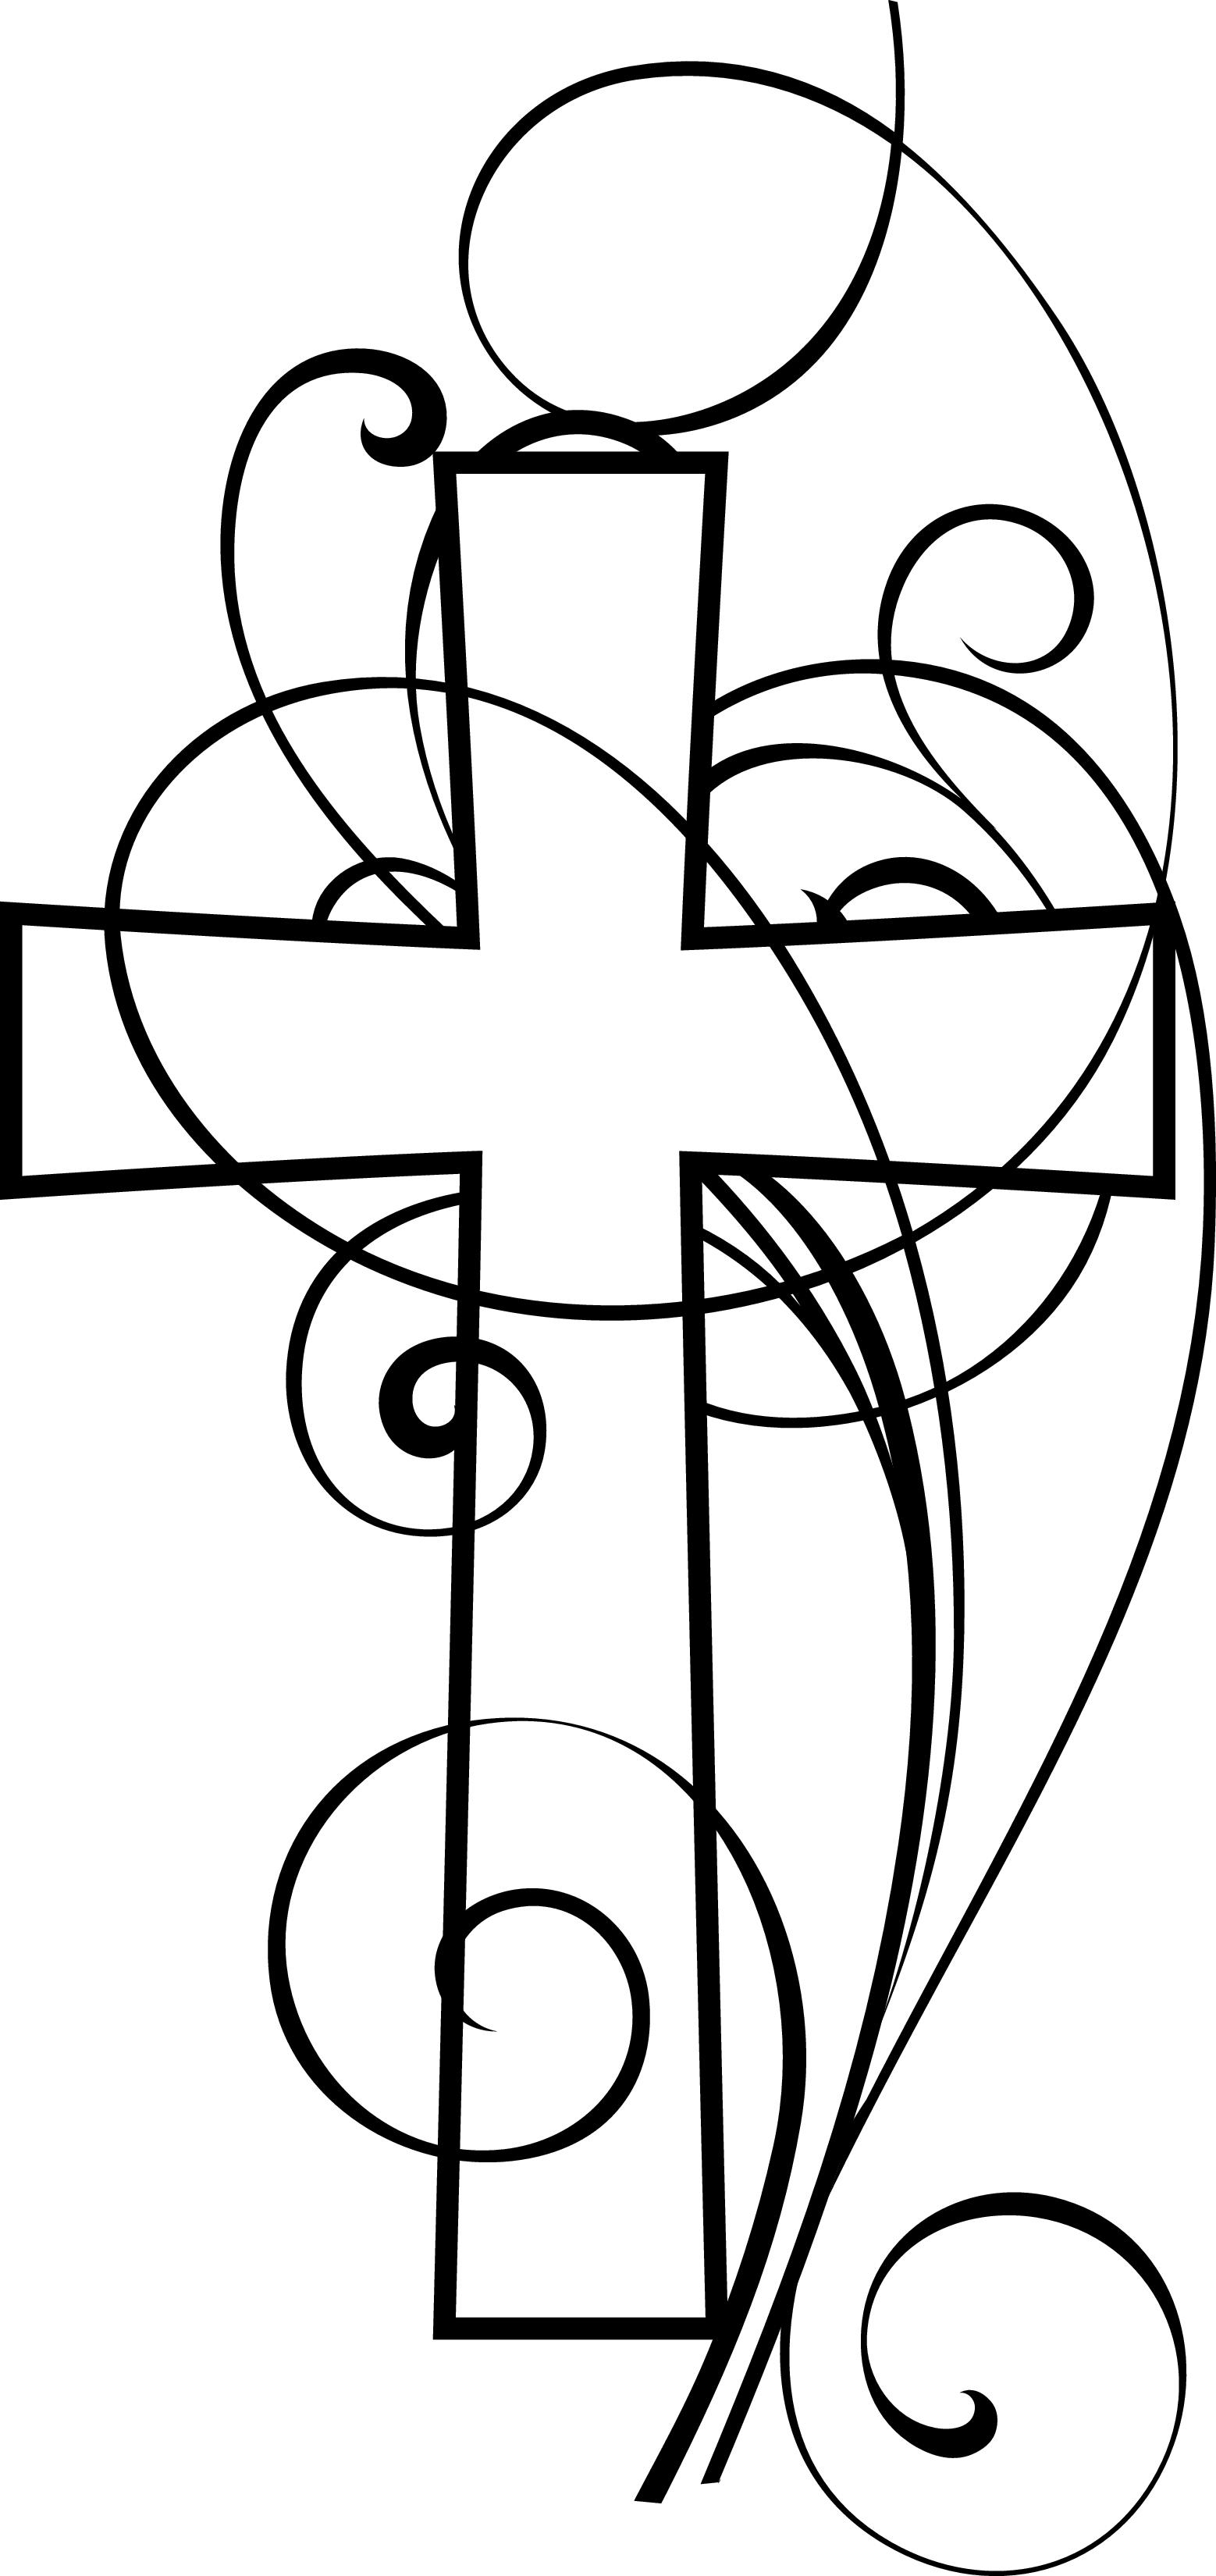 1558x3300 Free Clipart Cross